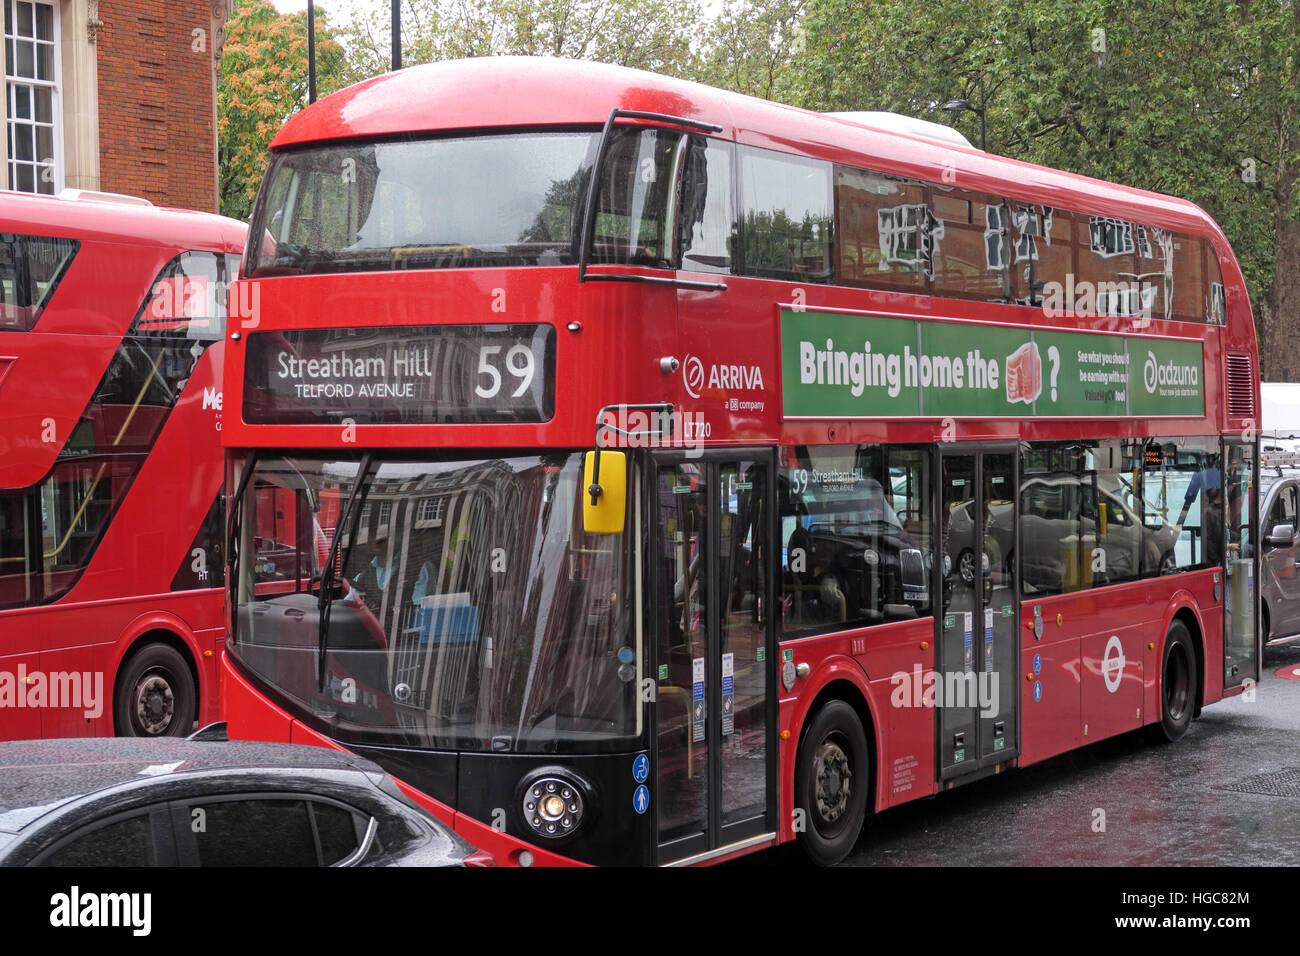 Hill,city,central,London,LDN,public,transport,transit,mass,private,privatised,regulated,deregulated,Boris,AEC,doors,door,London